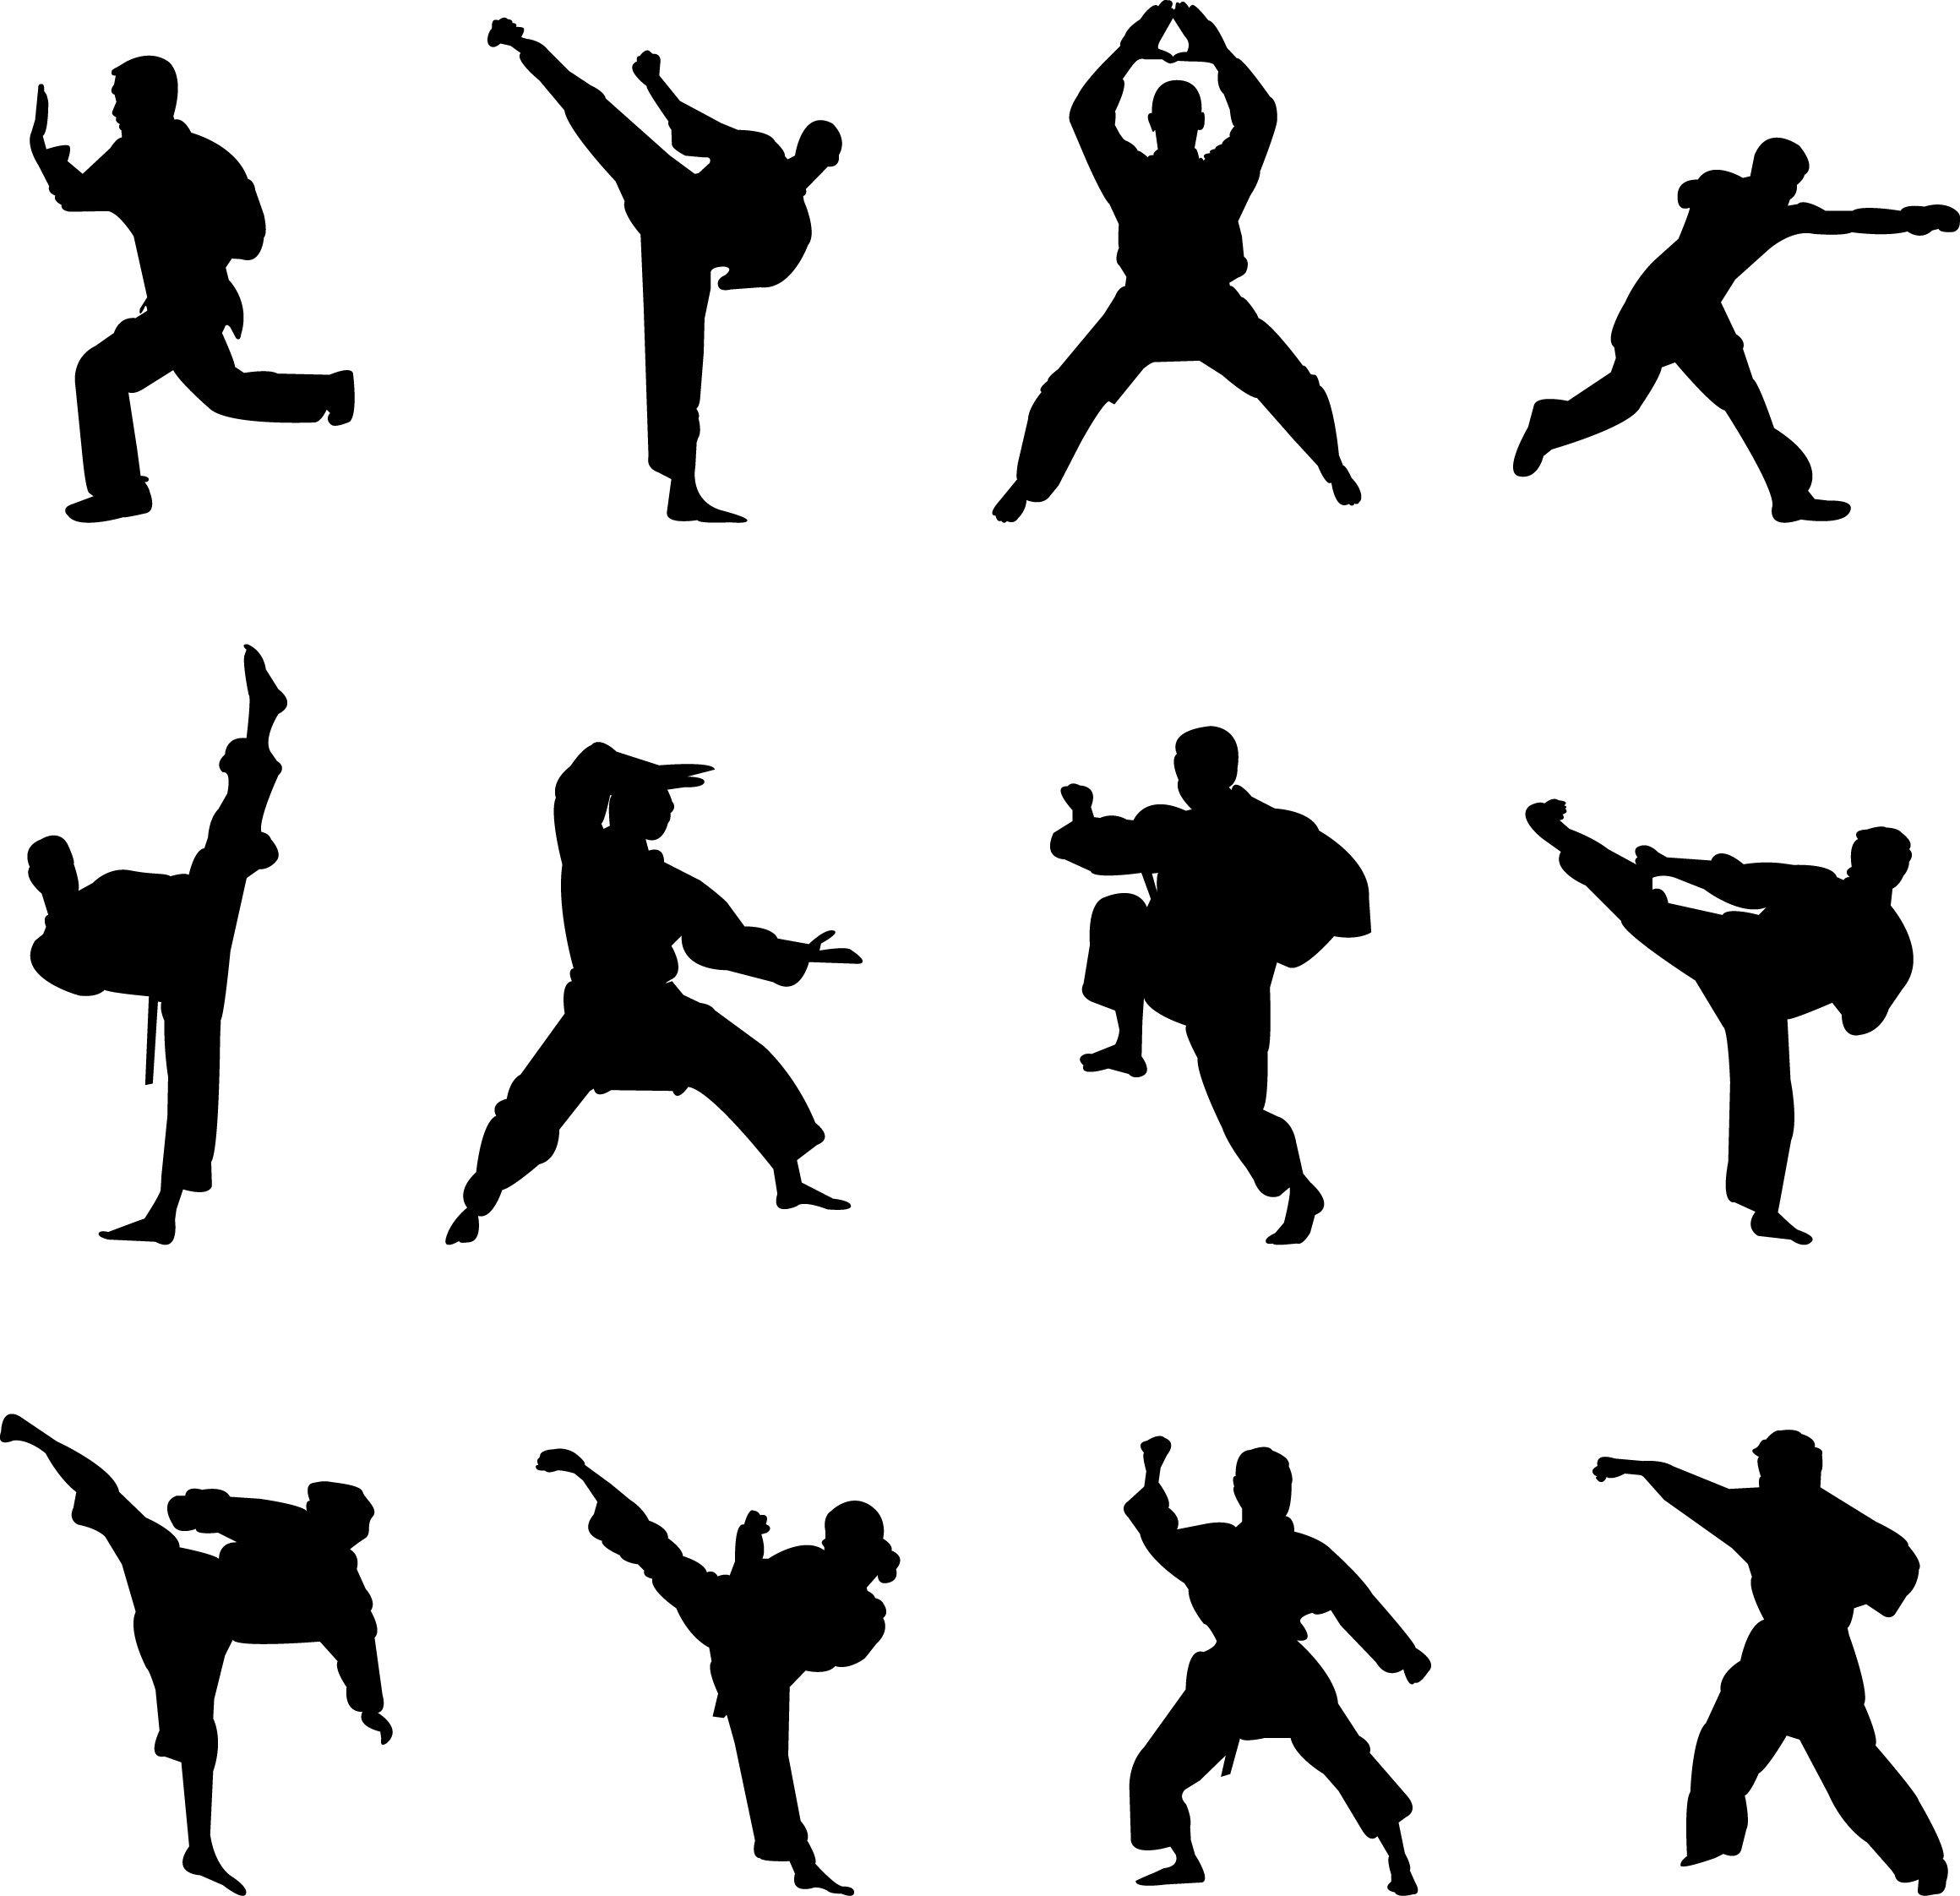 Martial Arts As Metaphor For Self Control